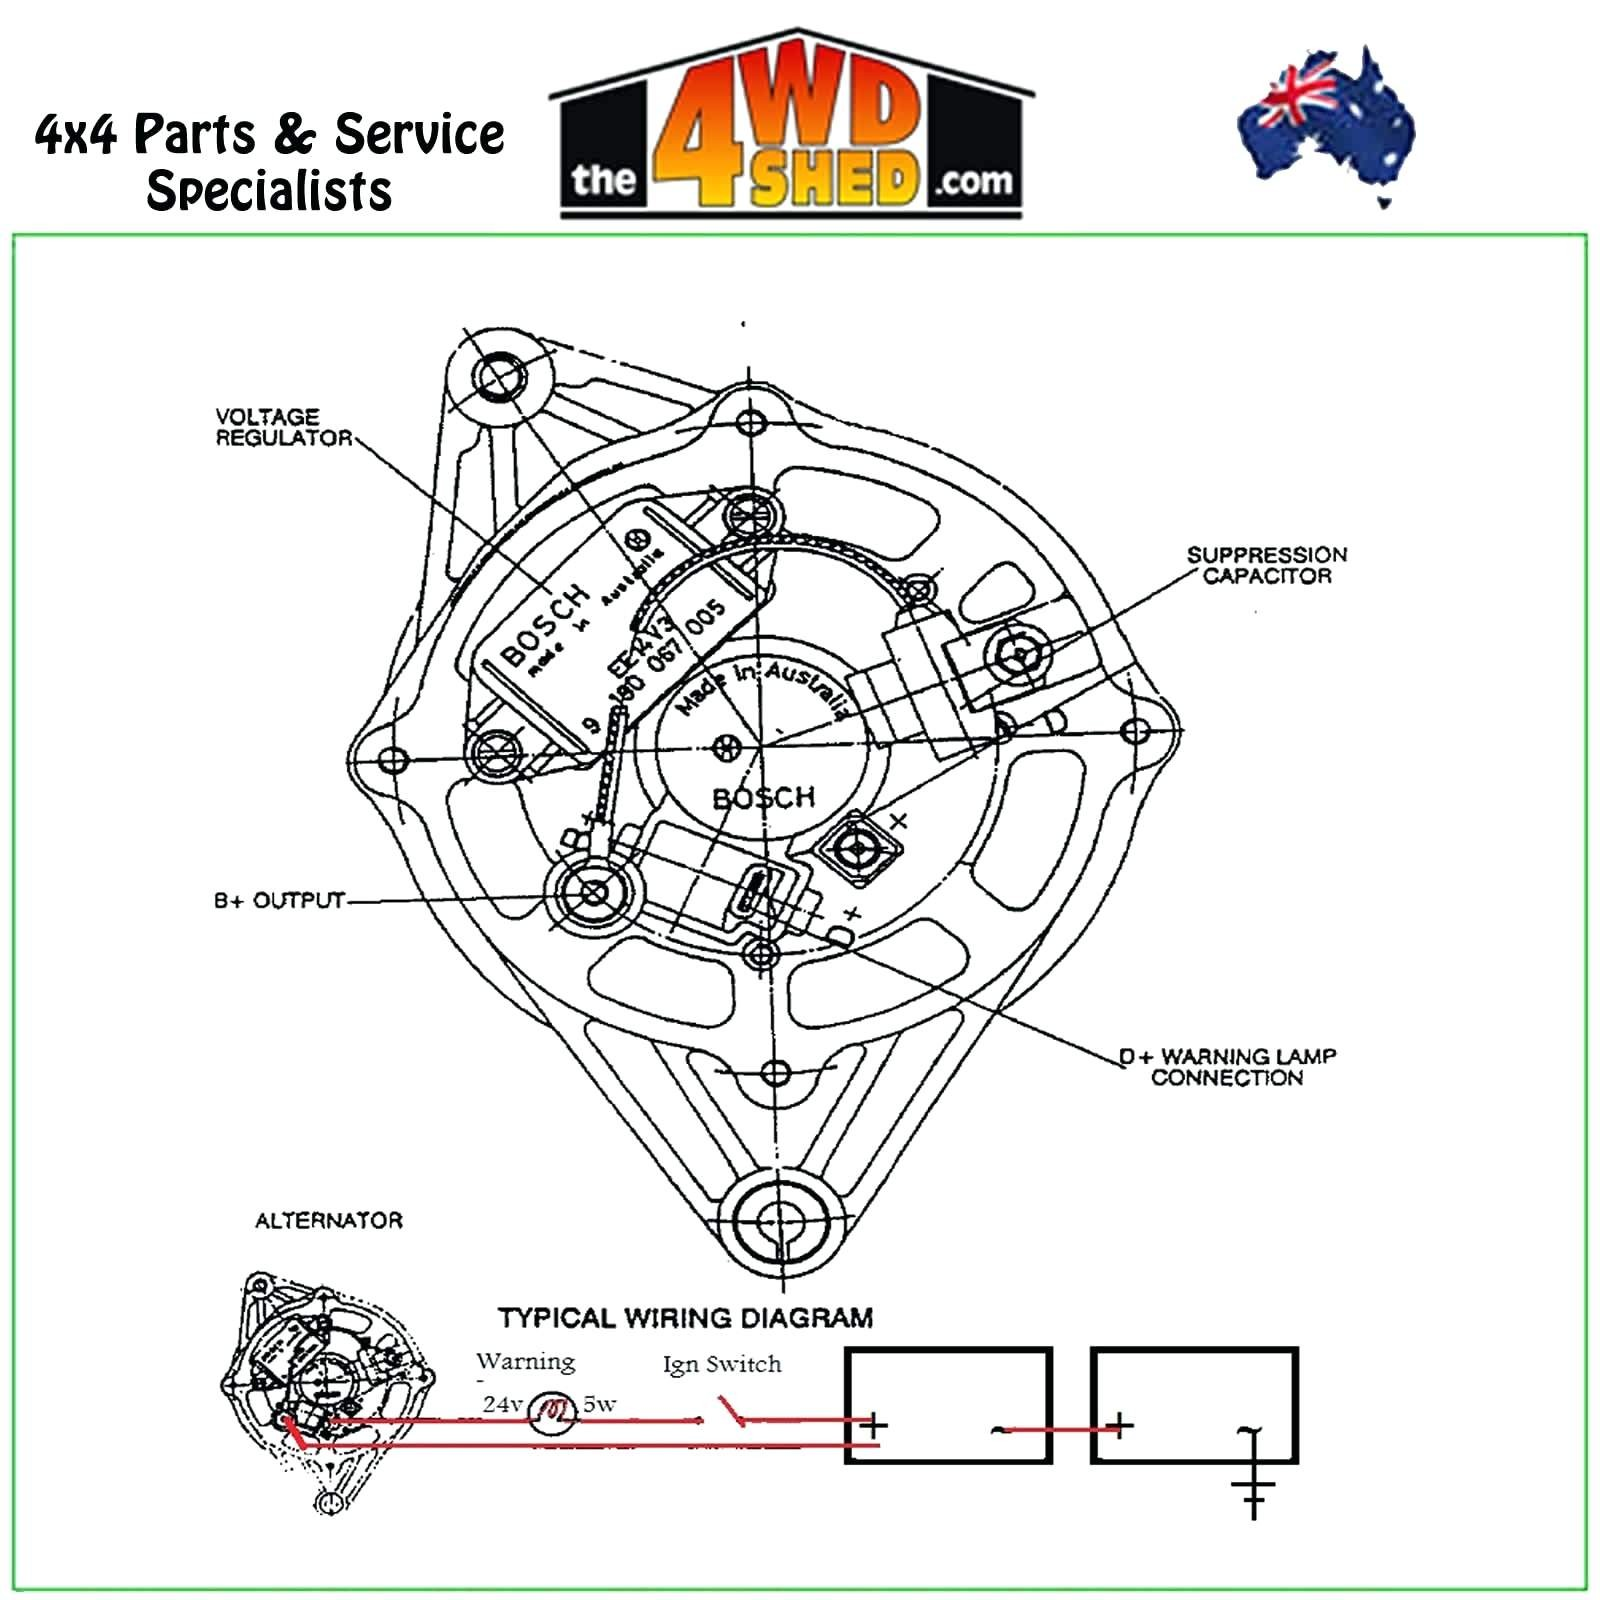 Wiring Bosch Diagram Alternator 60110181 Electrical Diagrams Denso 2006 Search For U2022 Rh Wiringdiagramworld Today